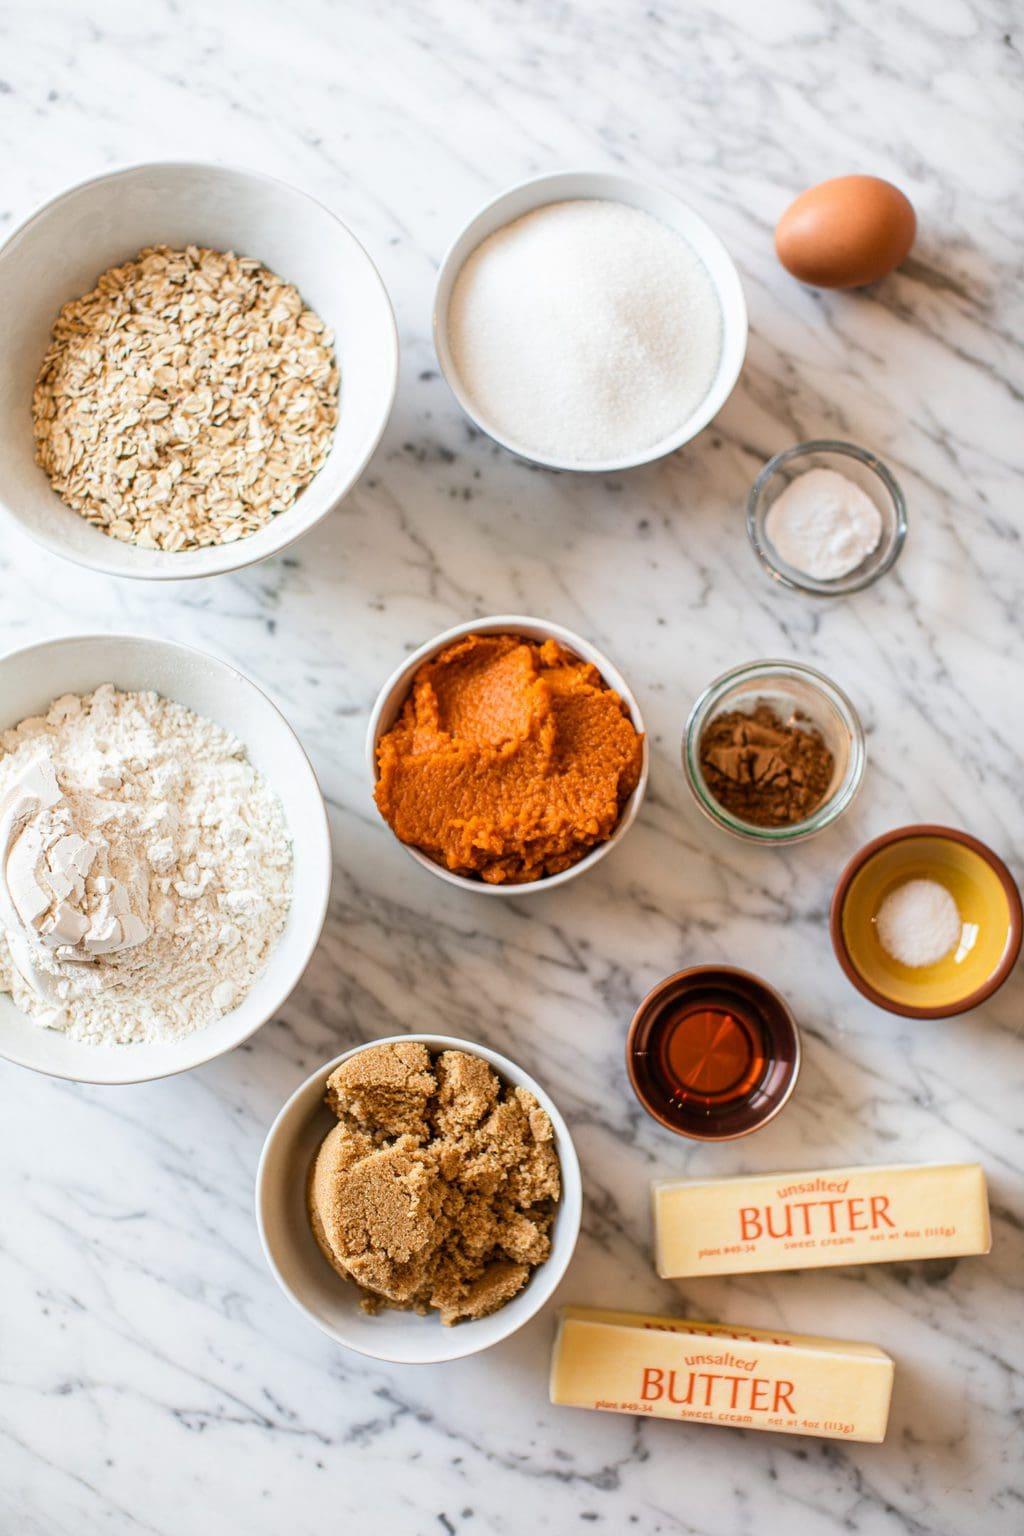 rolled oats, sugar, flour, pumpkin puree, brown sugar, cinnamon, salt, butter